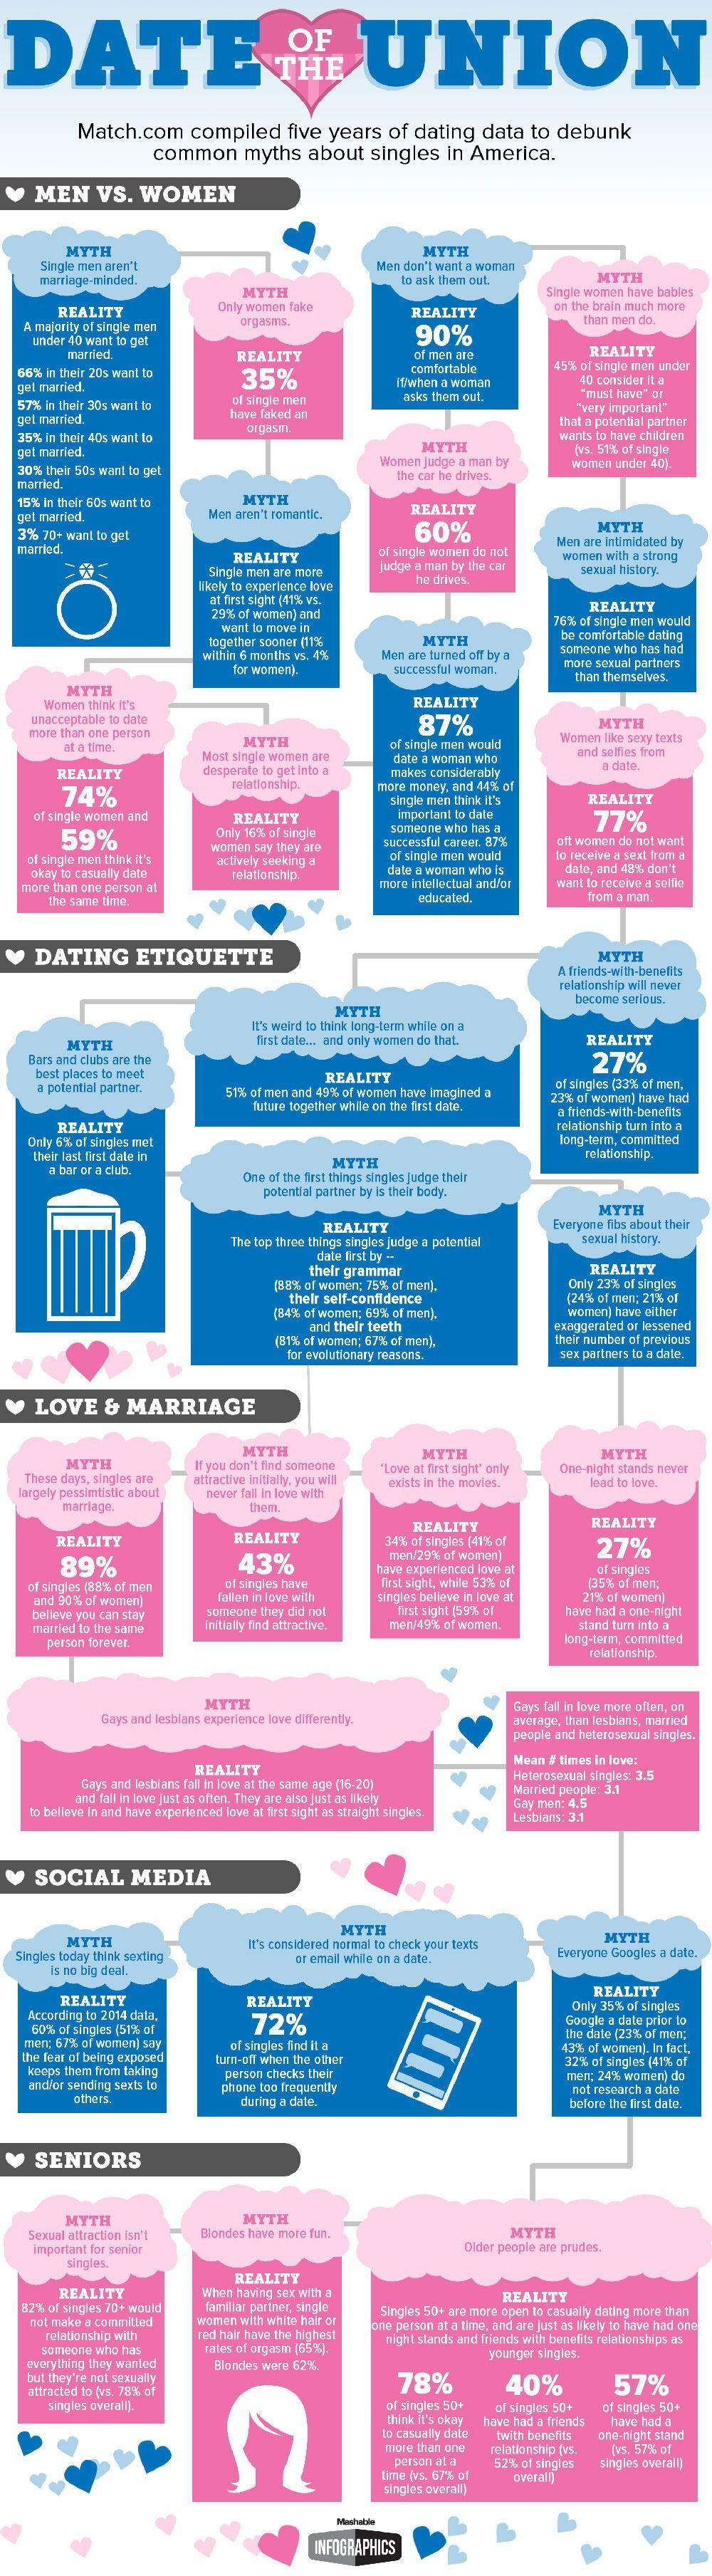 online dating ruining relationships